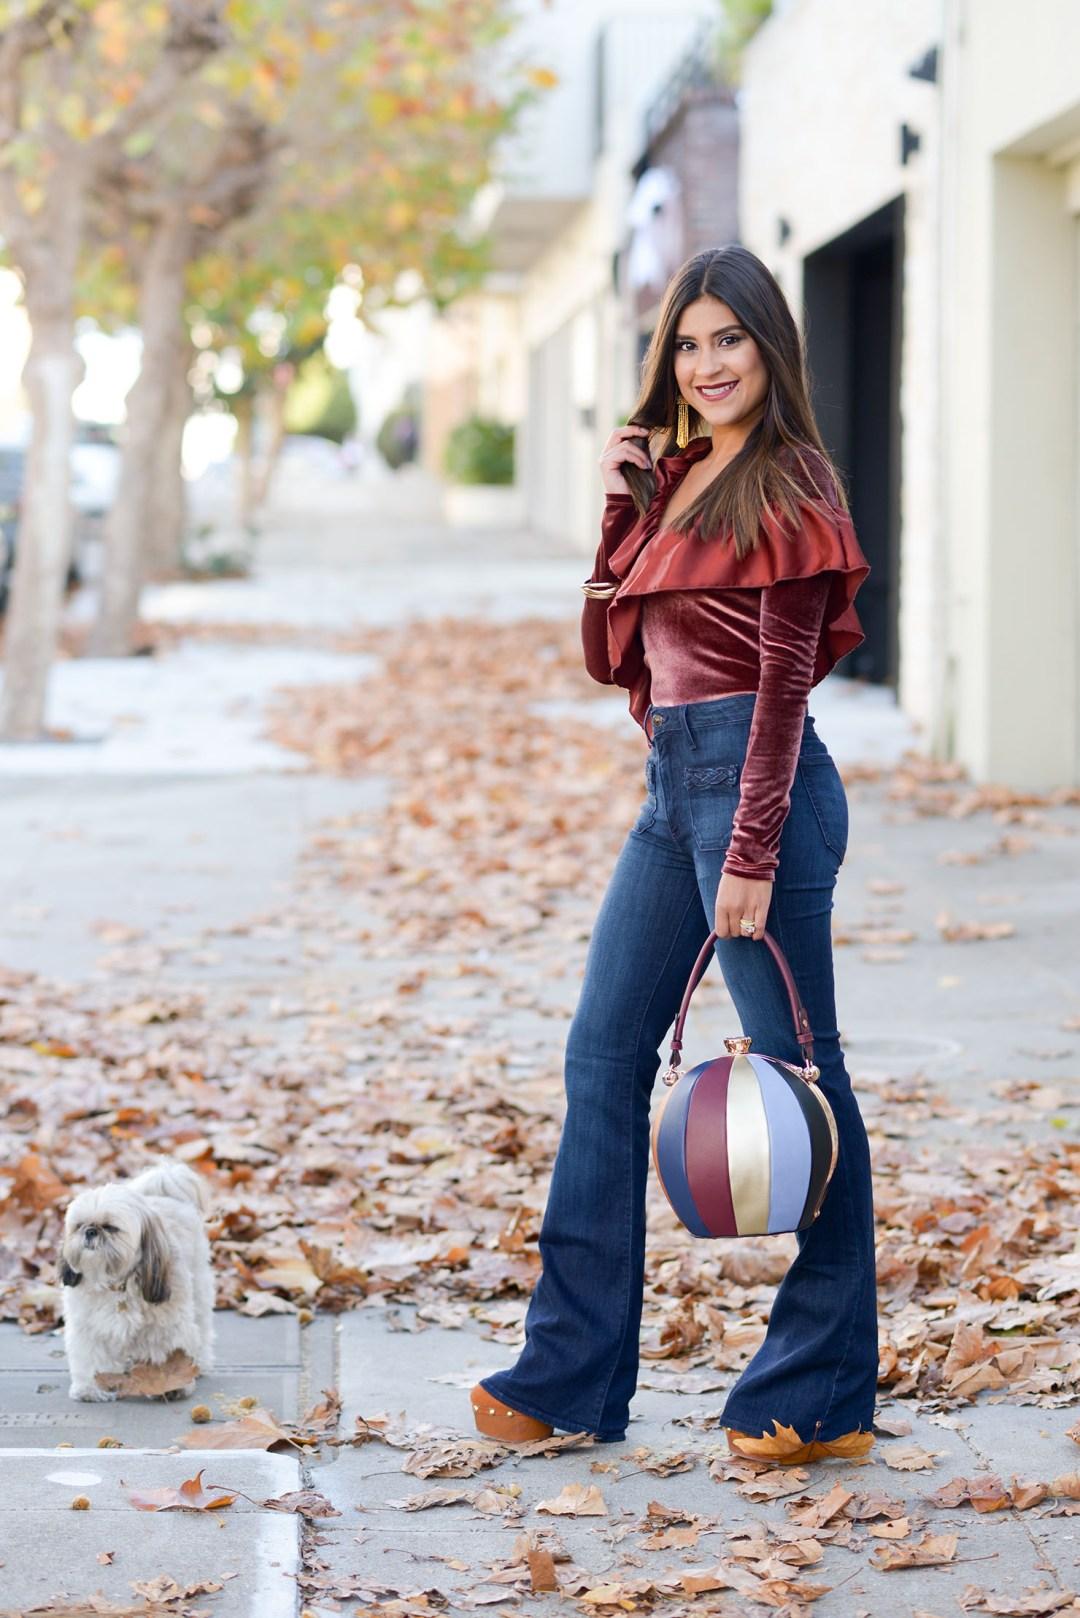 Lifestyle blogger Kelsey Kaplan of Kelsey Kaplan Fashion wearing velvet bodysuit and flare jeans